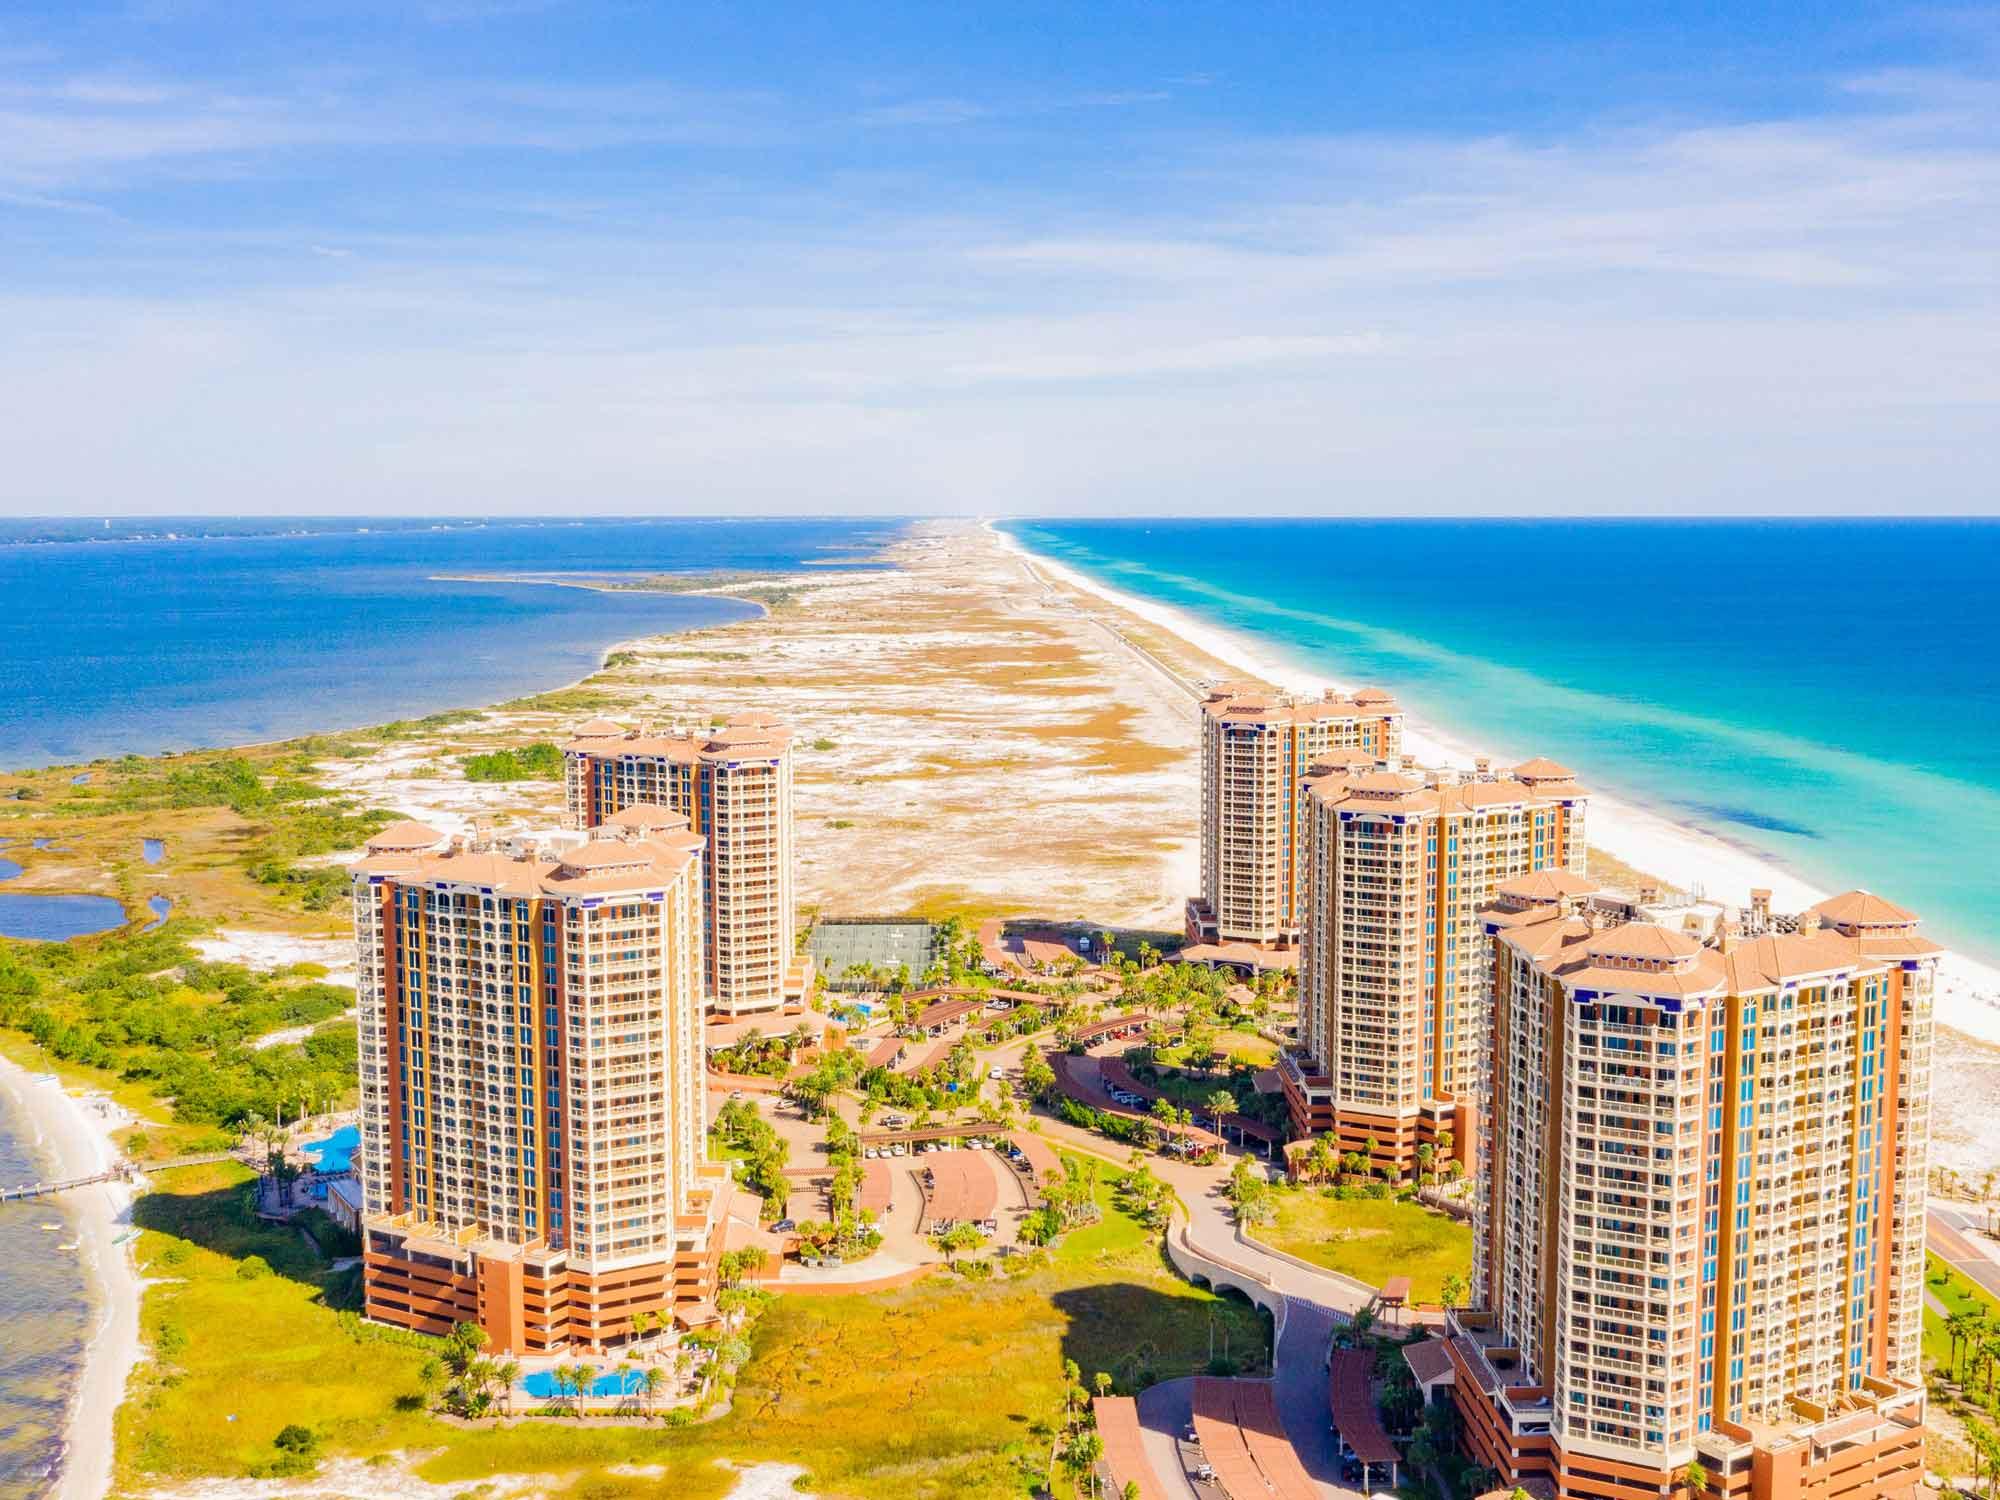 Pensacola Beach, Florida Vacation Rentals